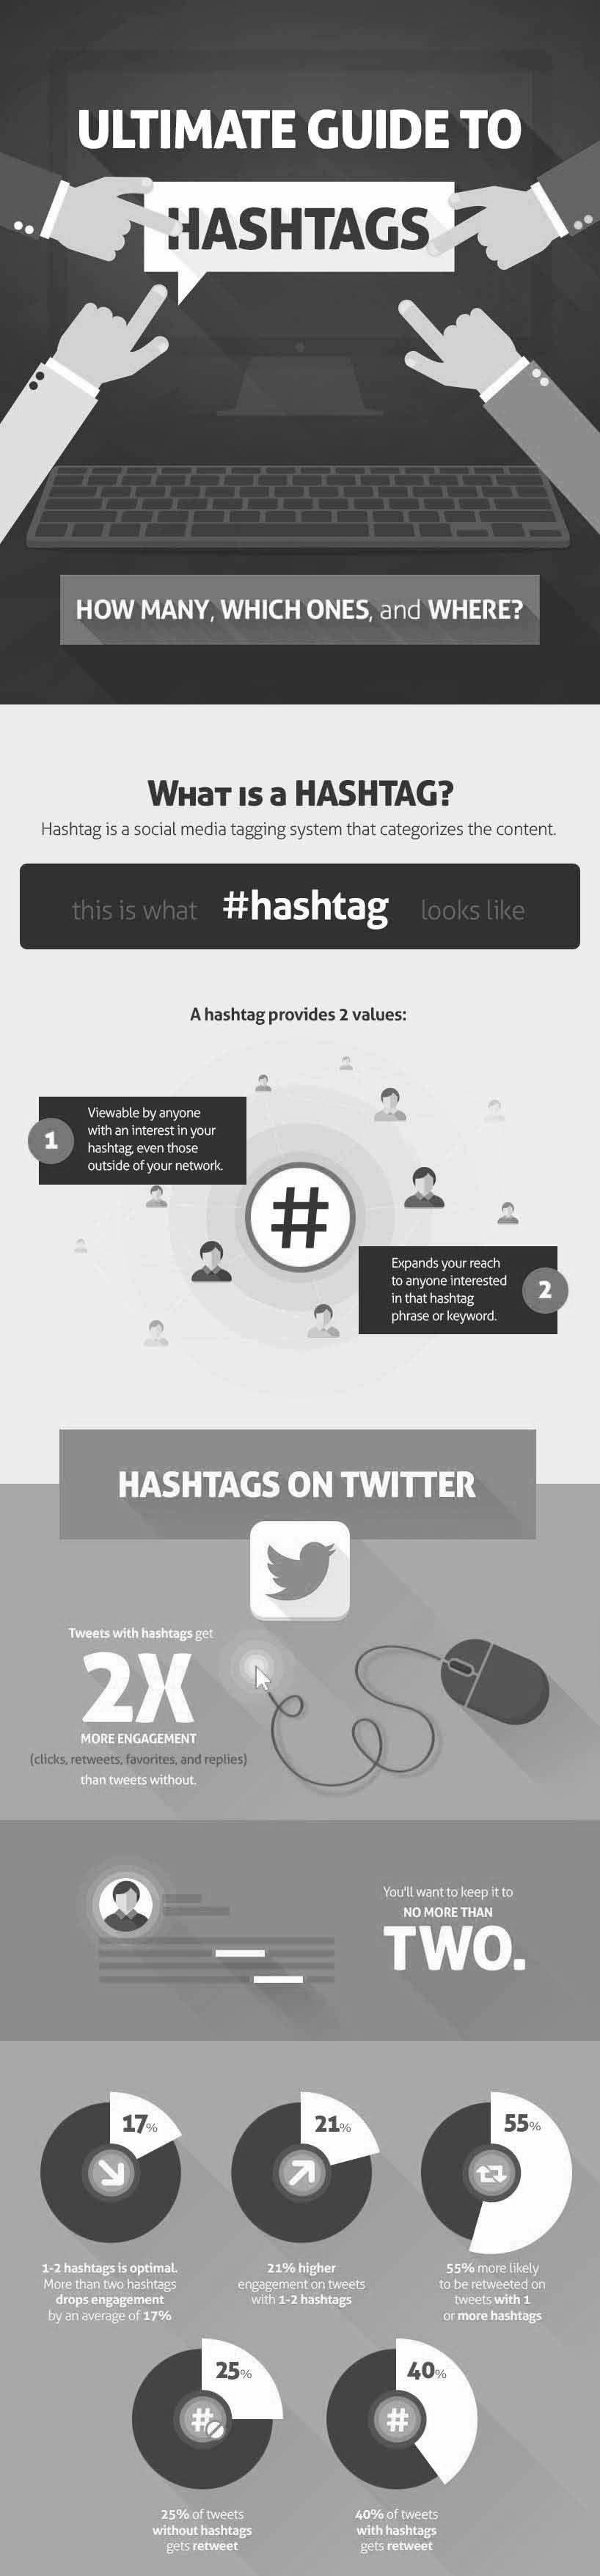 guia-definitiva-utilizar-hashtags-Twitter-Infografía